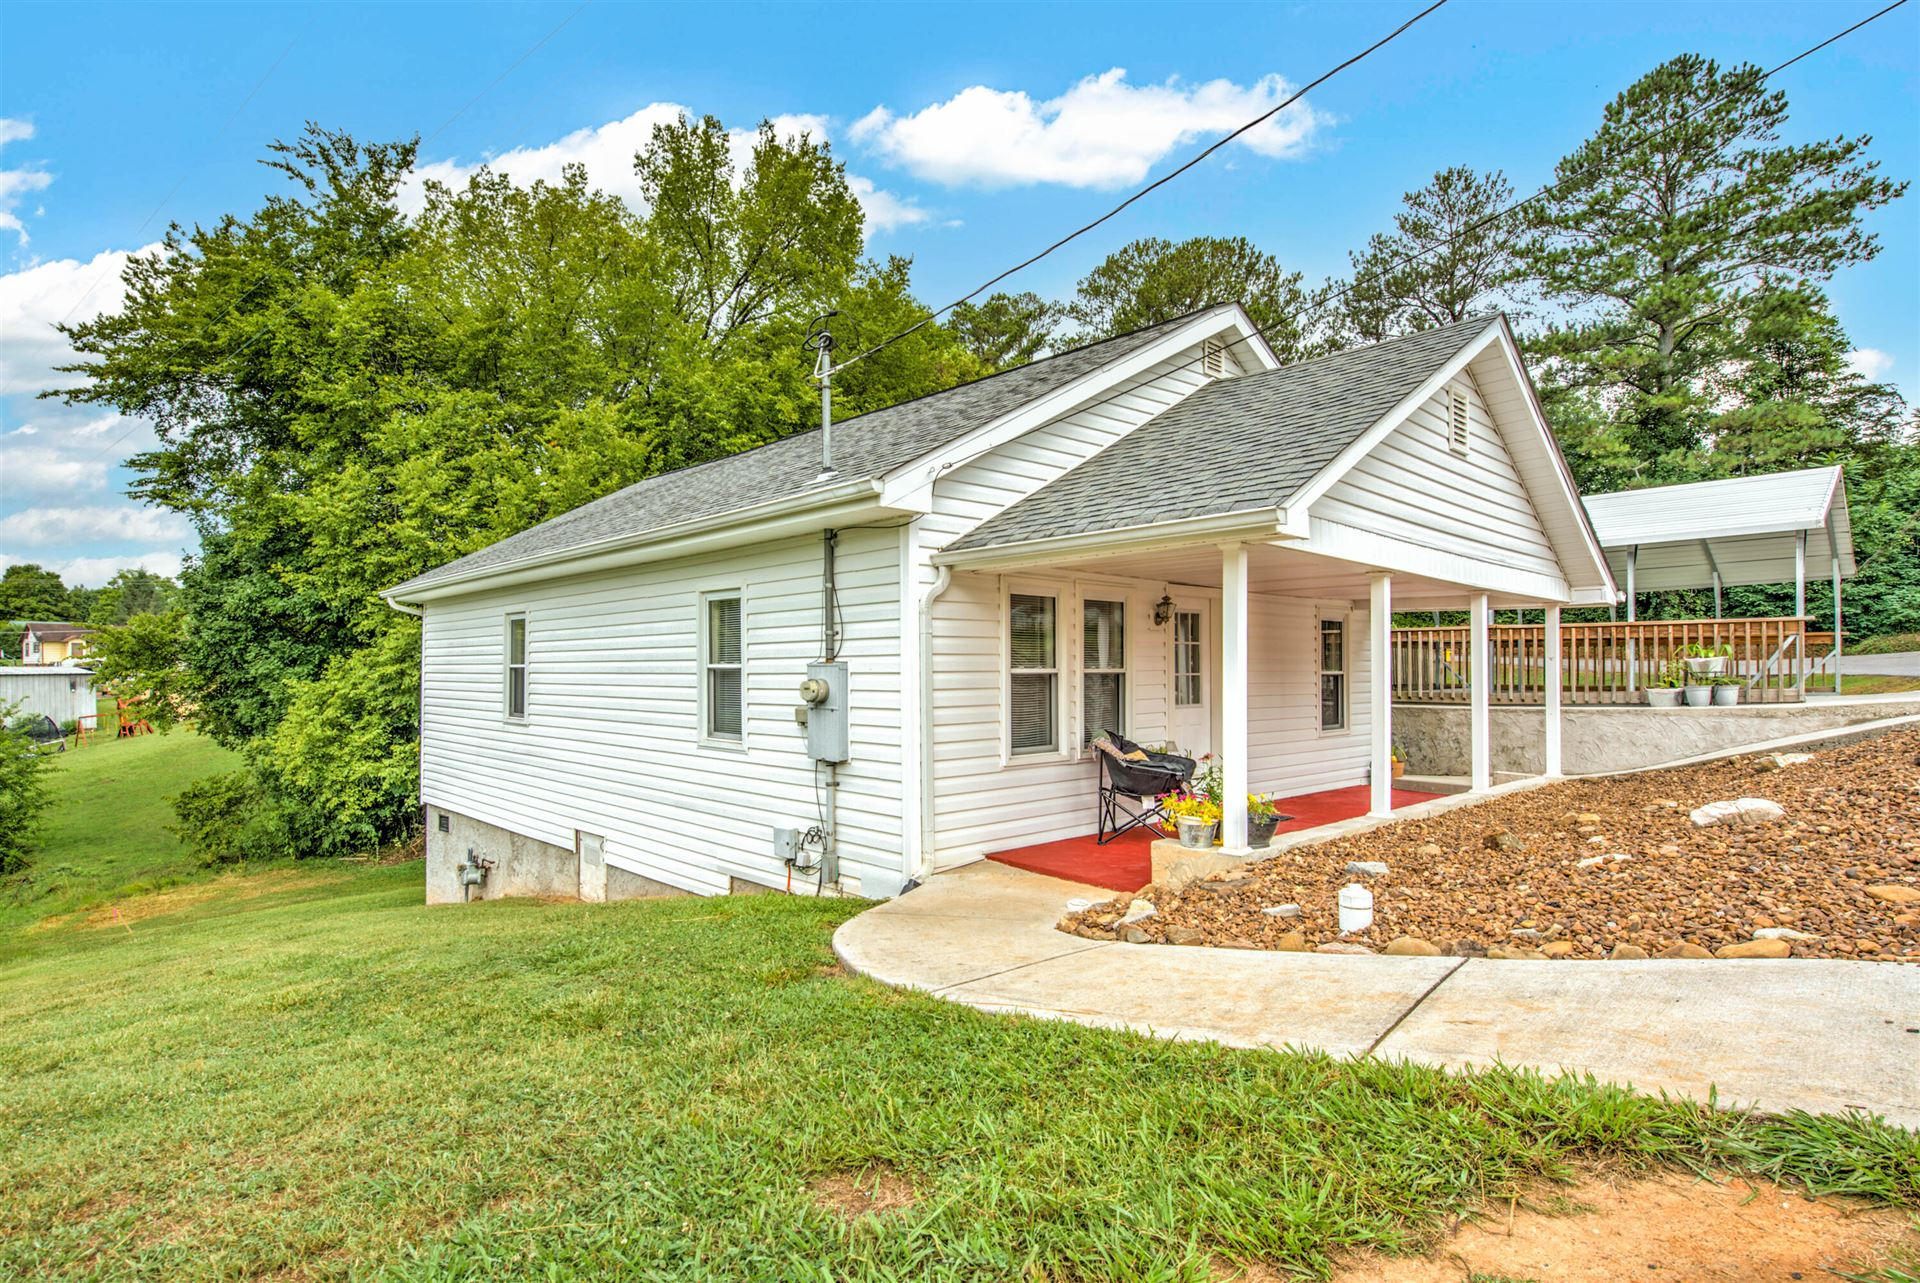 Photo of 504 Park Ave, Clinton, TN 37716 (MLS # 1160828)